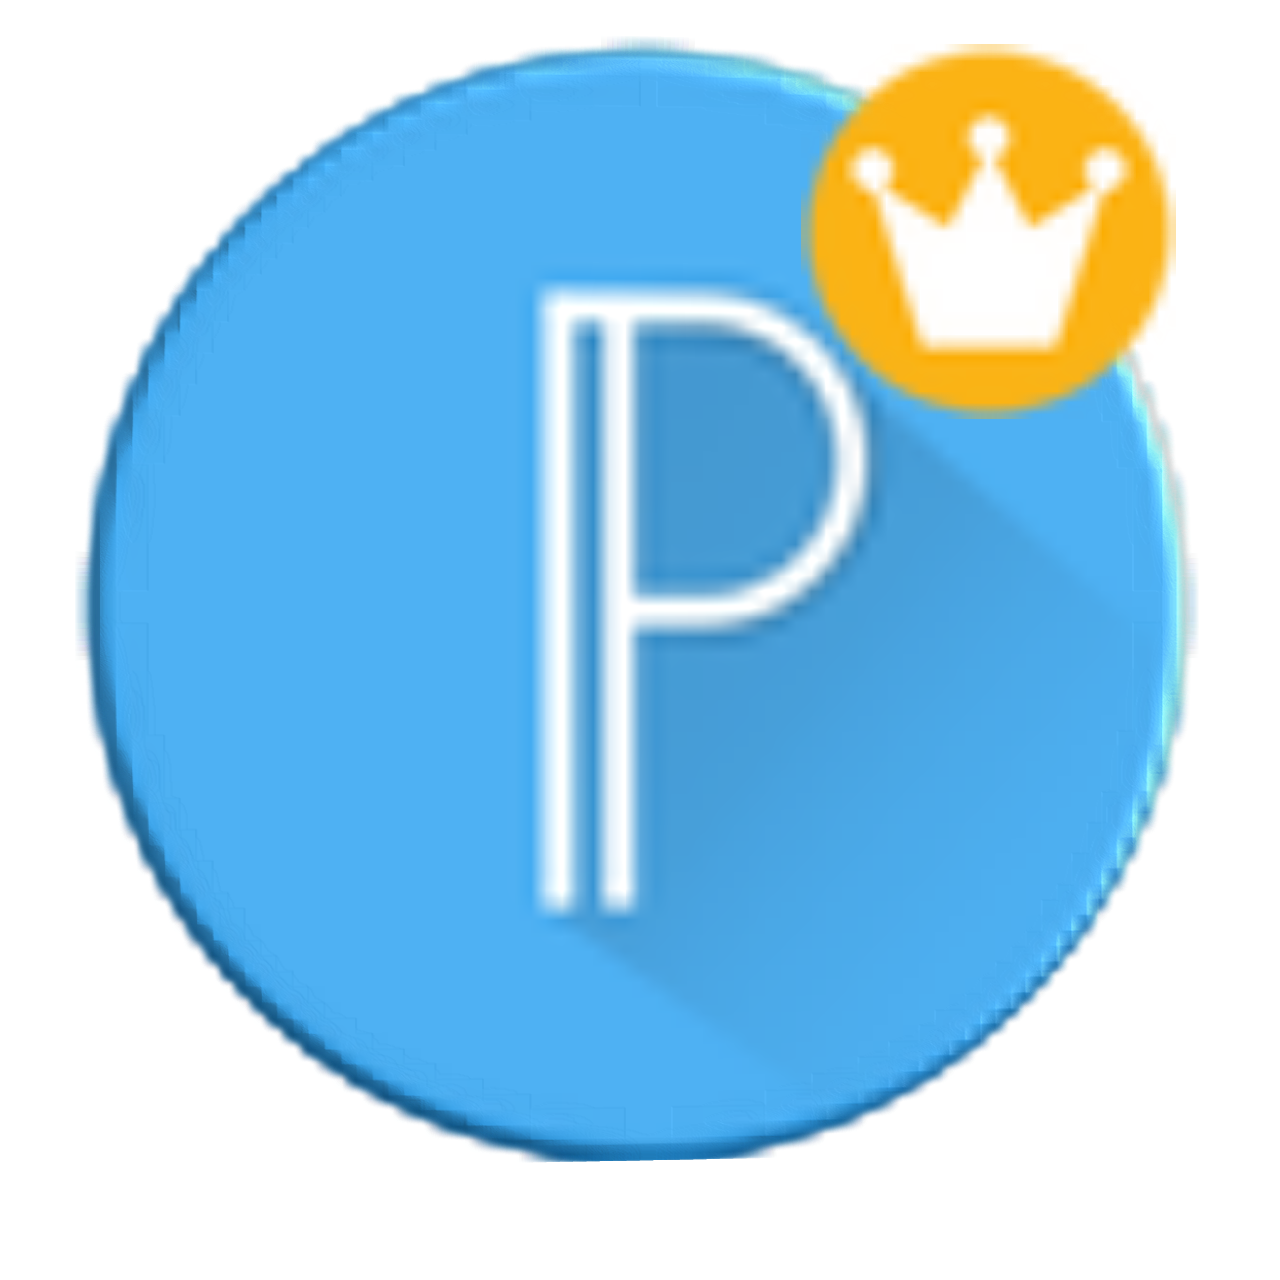 PixelLab অ্যাপকে Pro/Premium ভার্সন এর করুন একদম সহজ উপায়ে।(Root Needed😁)[না দেখলেই লস😀]